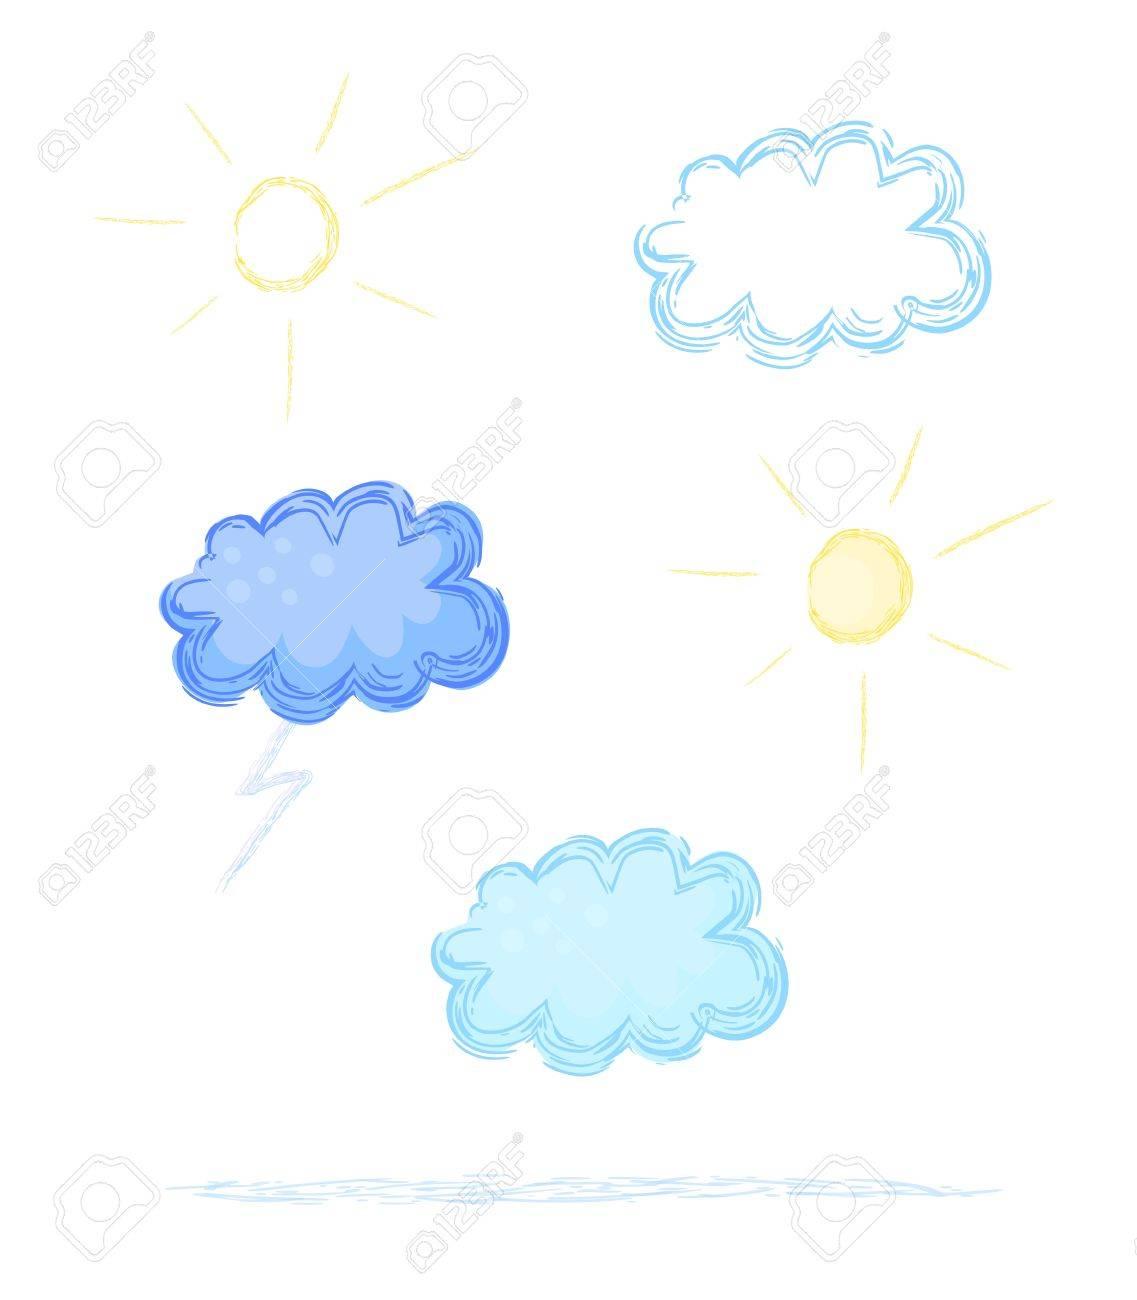 Eps 10 vector weather sketch illustrations Clouds, lightning,